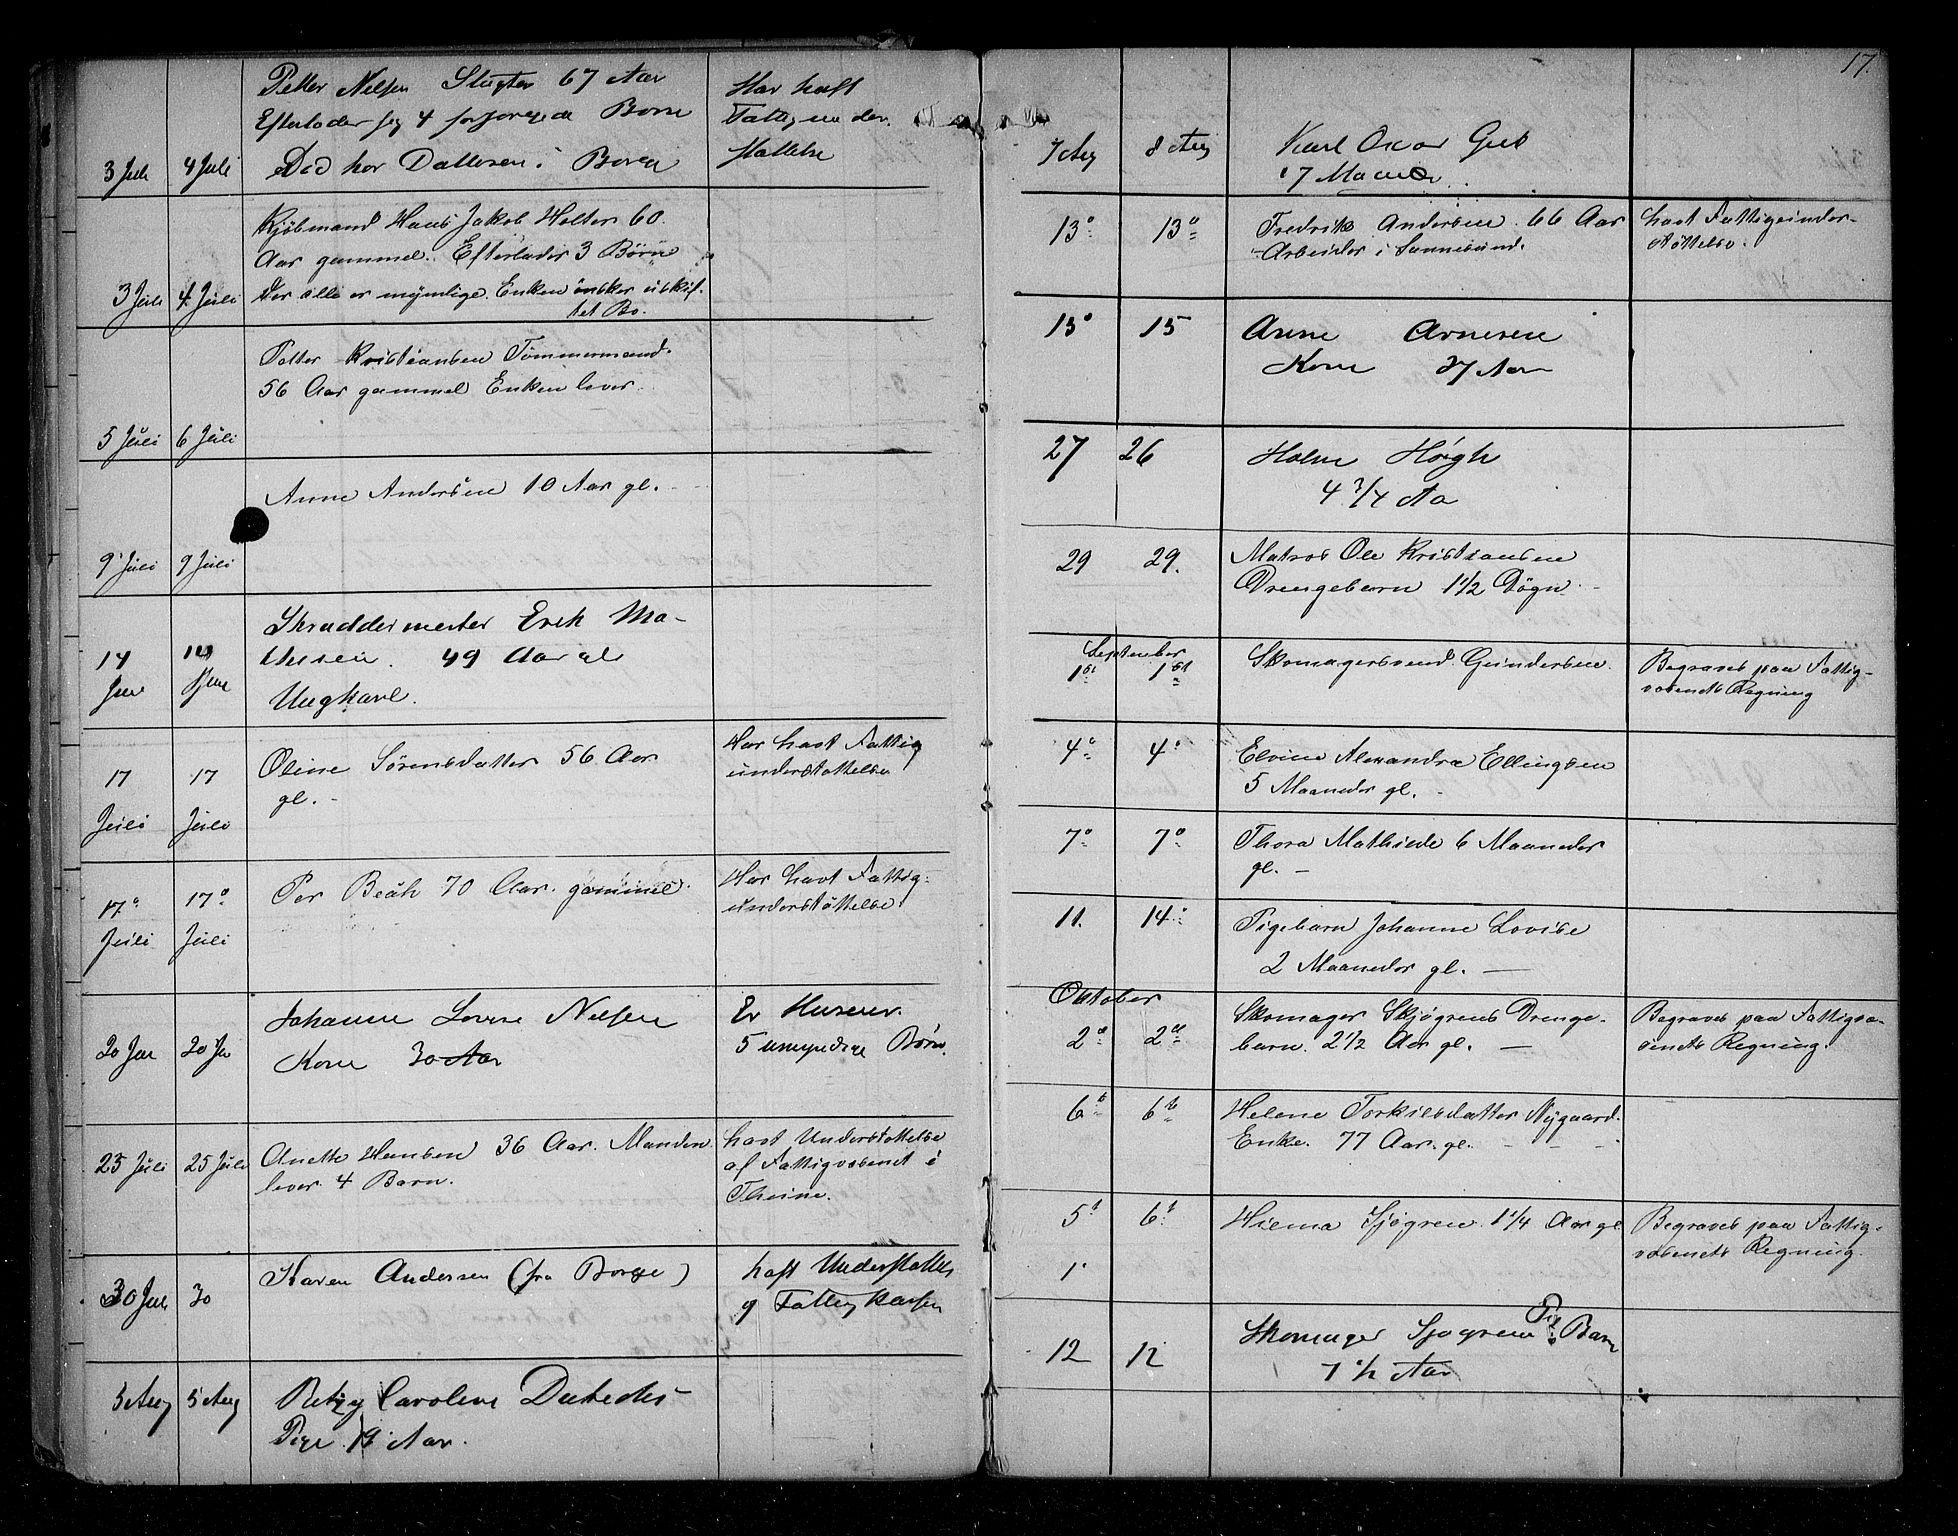 SAO, Sarpsborg byfogd, H/Ha/Haa/L0001: Dødsfallsprotokoll, 1880-1904, s. 16b-17a